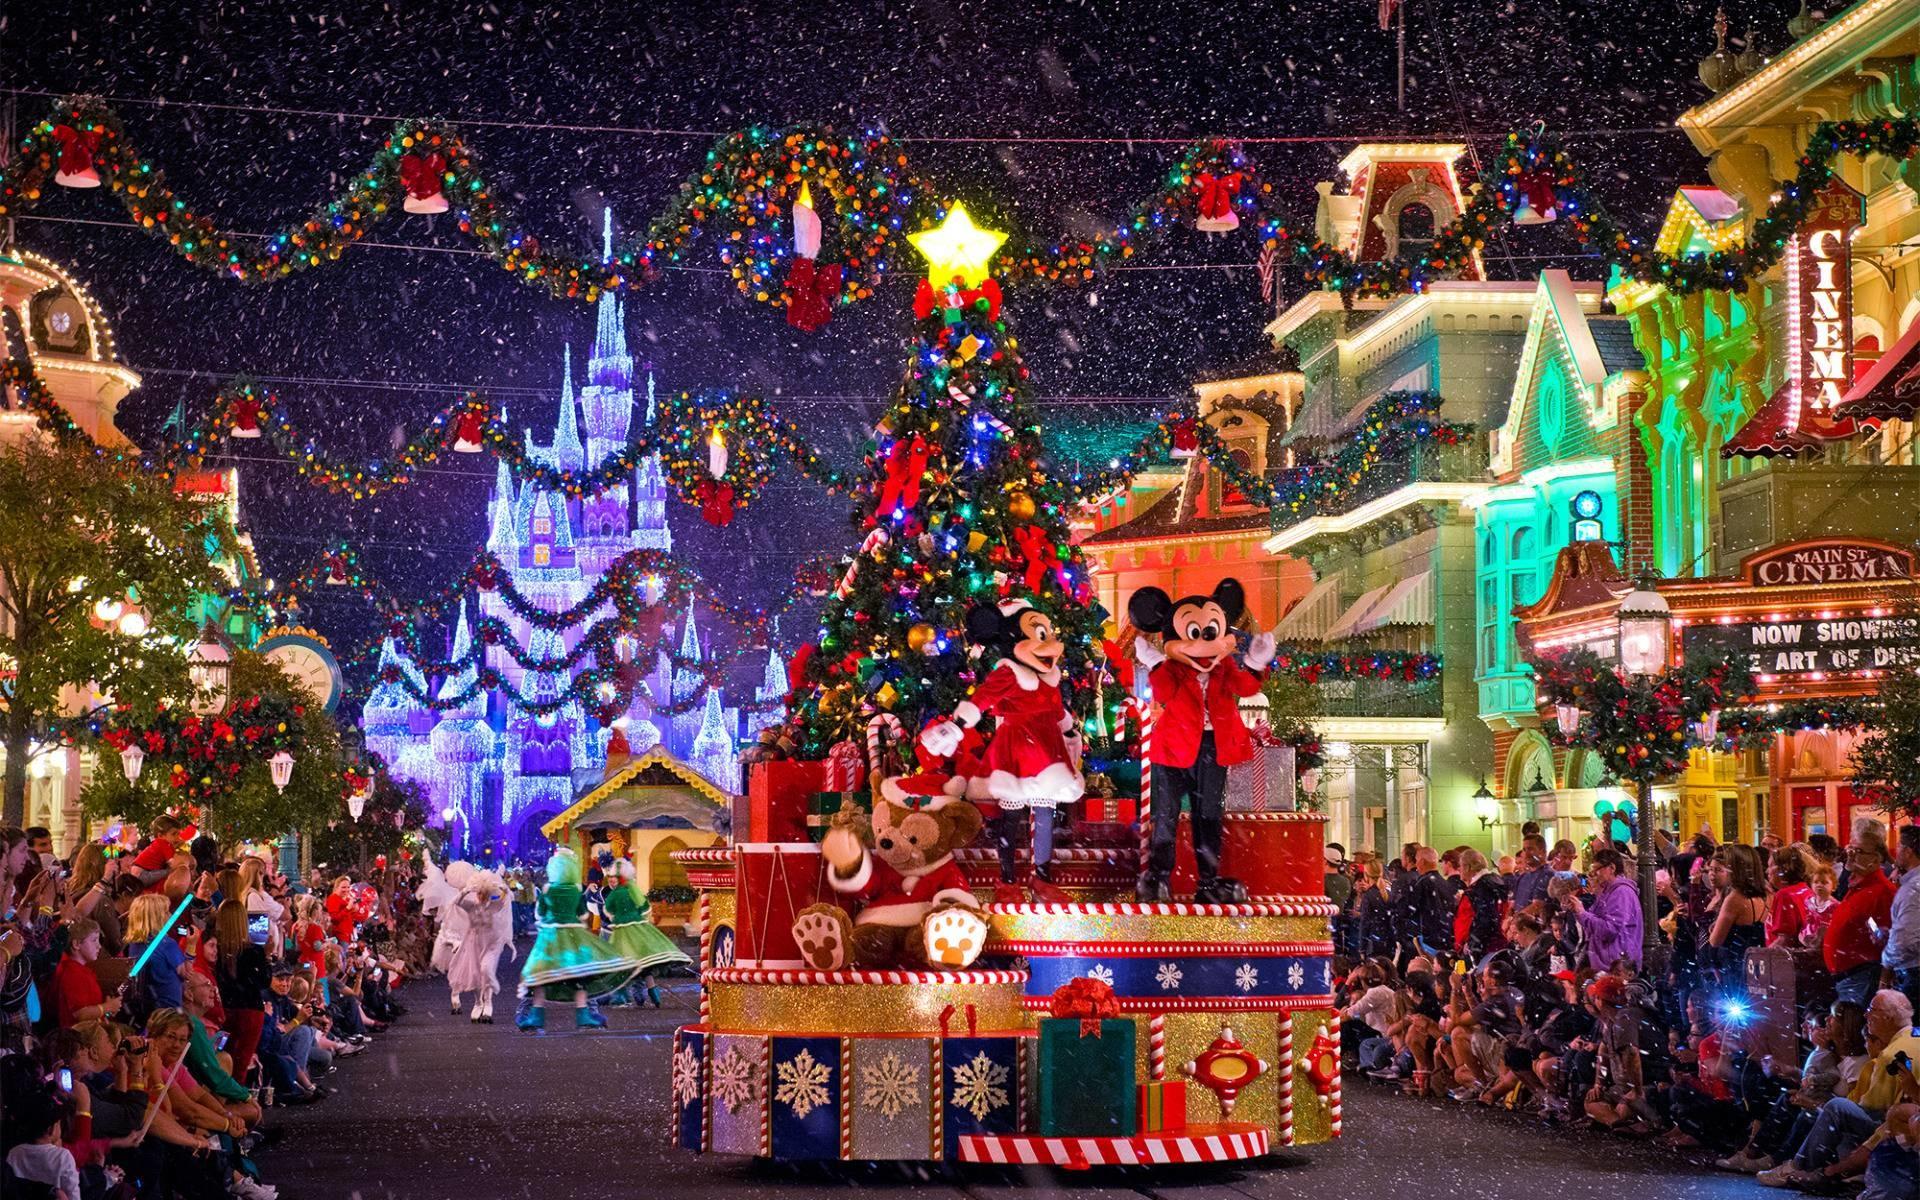 Disney Christmas Parade on Main Street widescreen wallpaper | Wide-